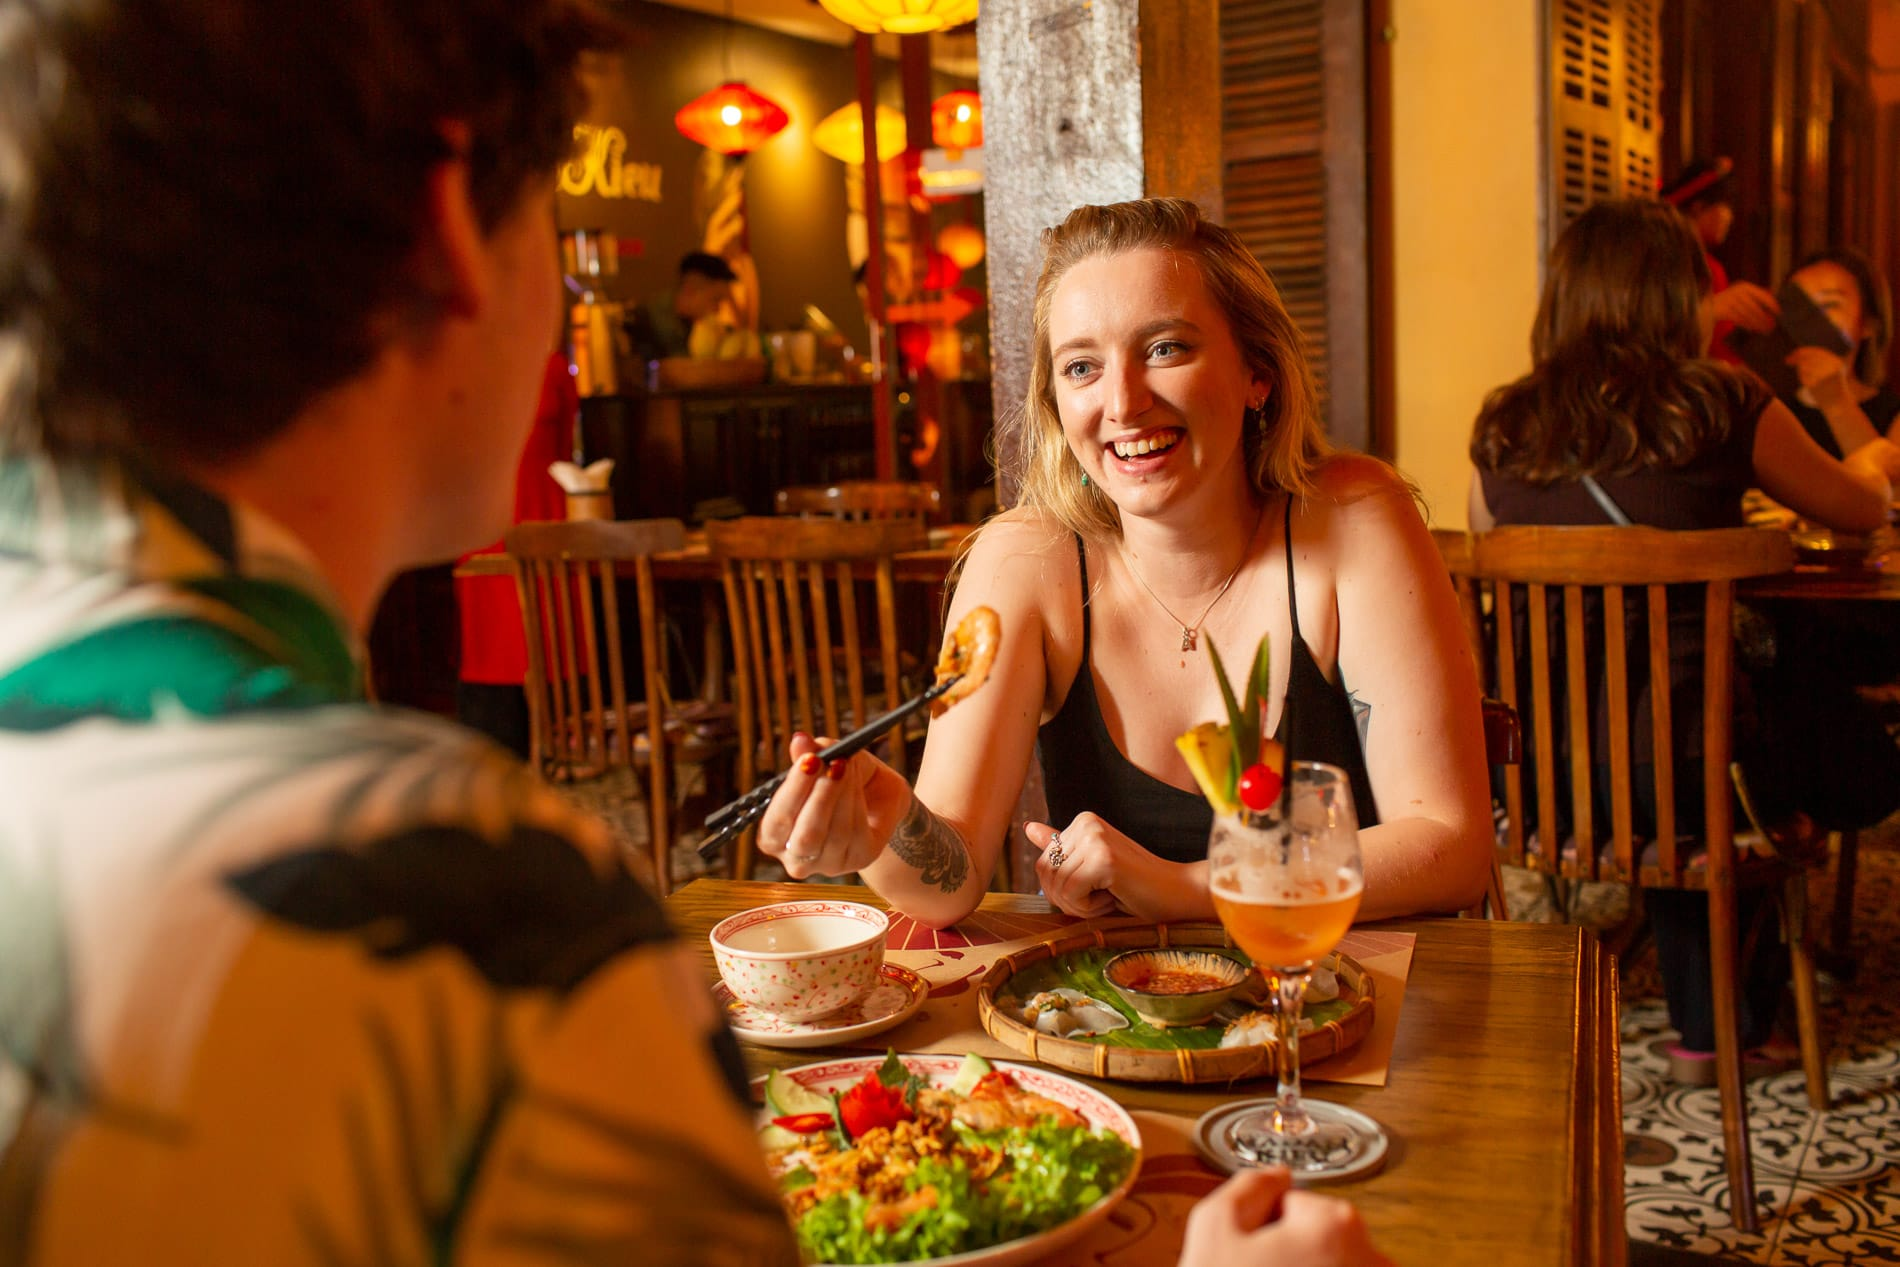 Dinner date in Hoi An